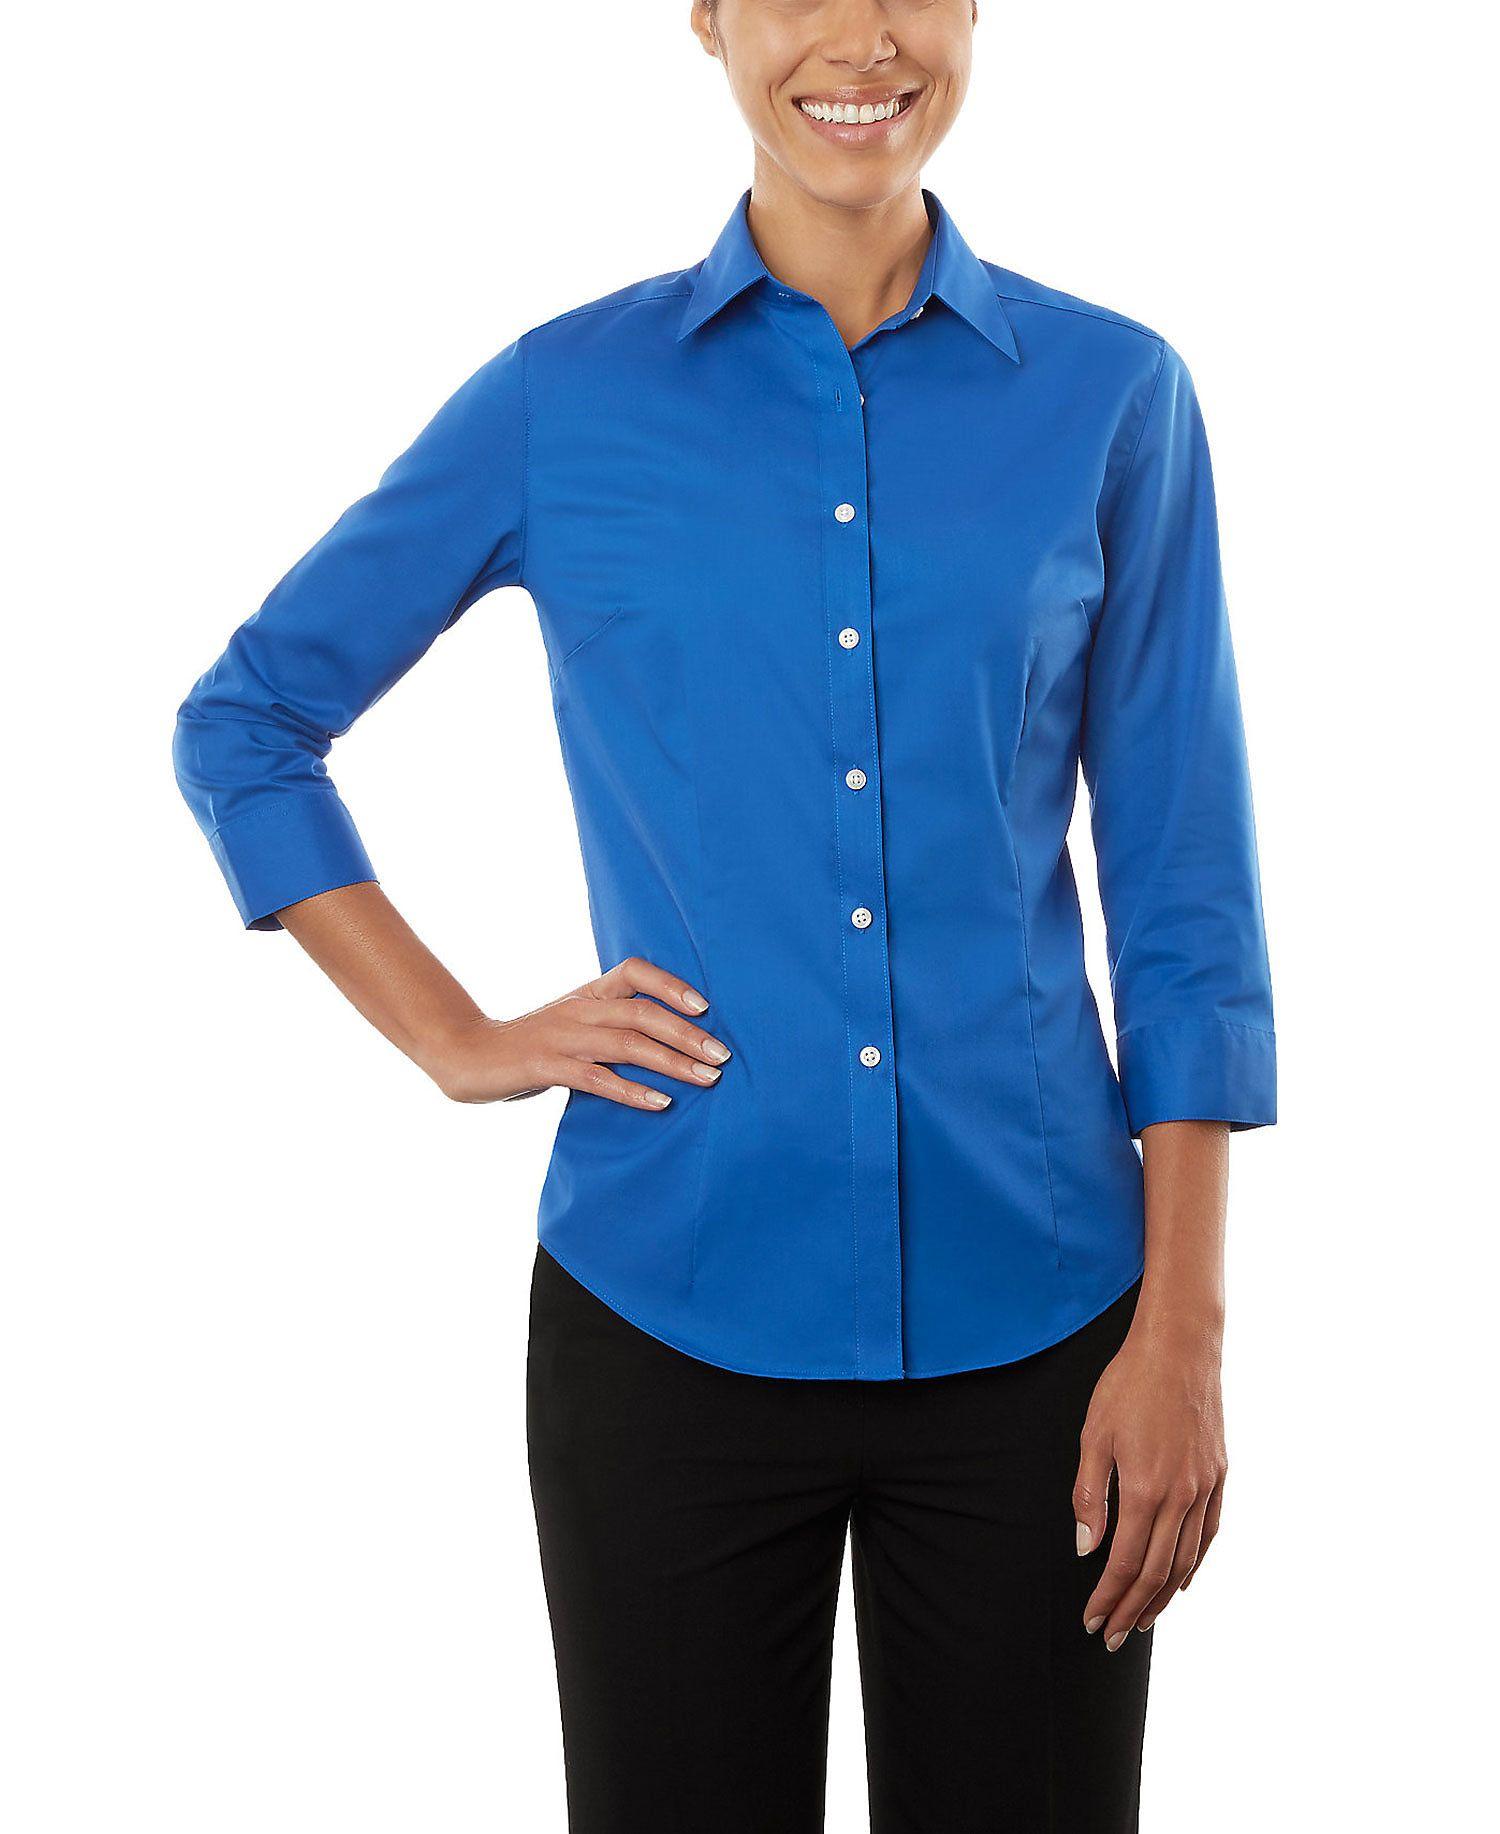 Van Heusen Van Heusen Ladies 3 4 Sleeve Dress Twill Shirt Walmart Com Style Inspiration Casual Twill Shirt Clothes [ 1834 x 1500 Pixel ]